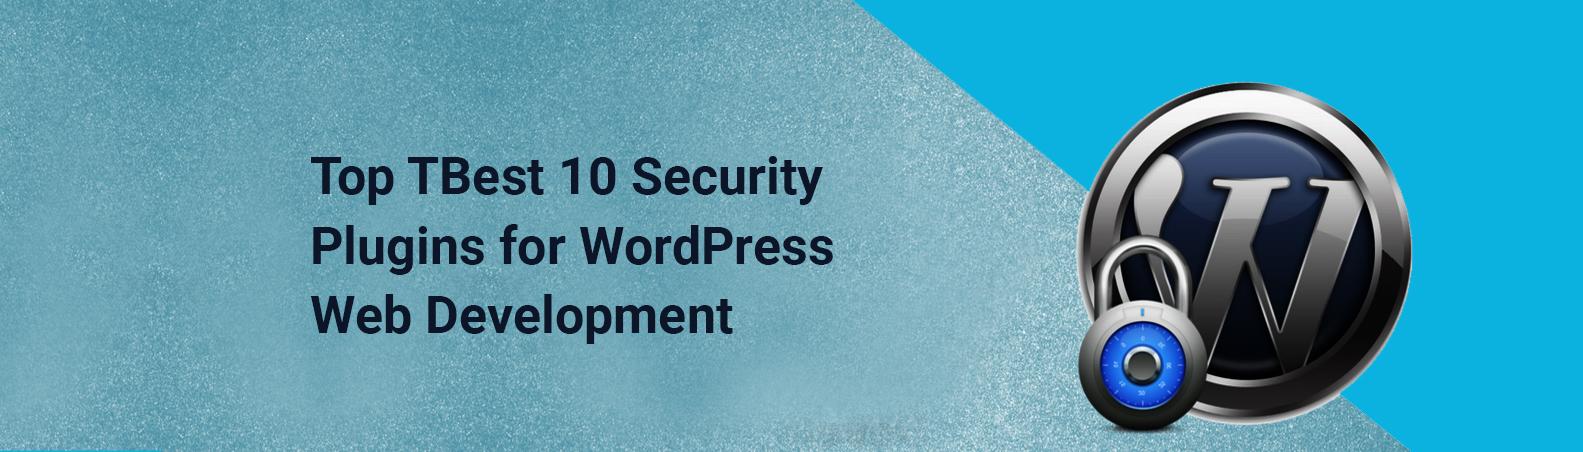 Best 10 Security Plugins for WordPress Web Development